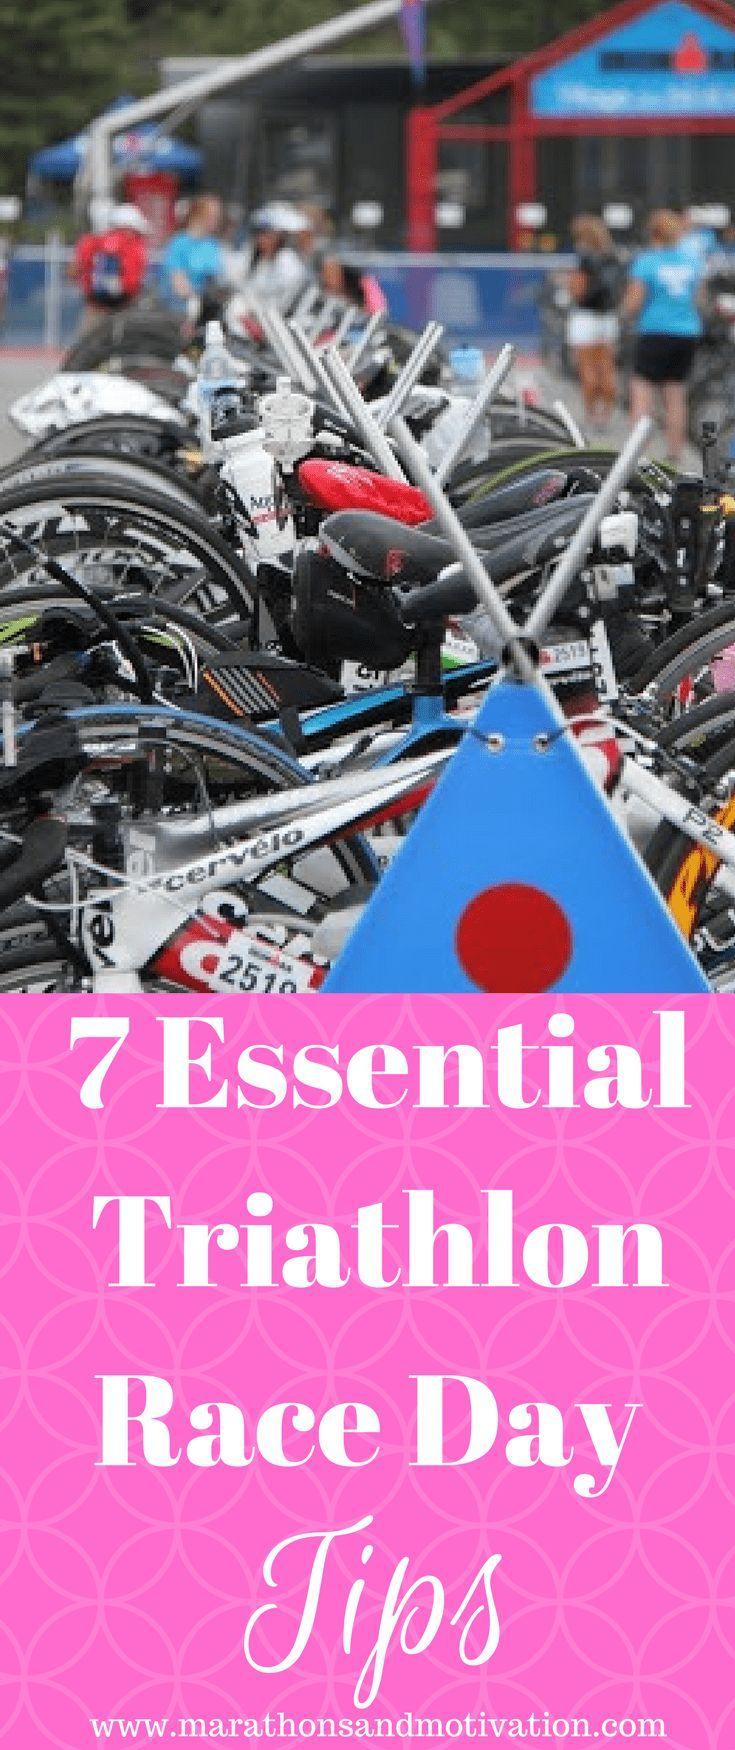 Seven Essential Triathlon Race Day Tips: #Triathlon #IronmanTriathlon #SprintTriathlon | Triathlon R...